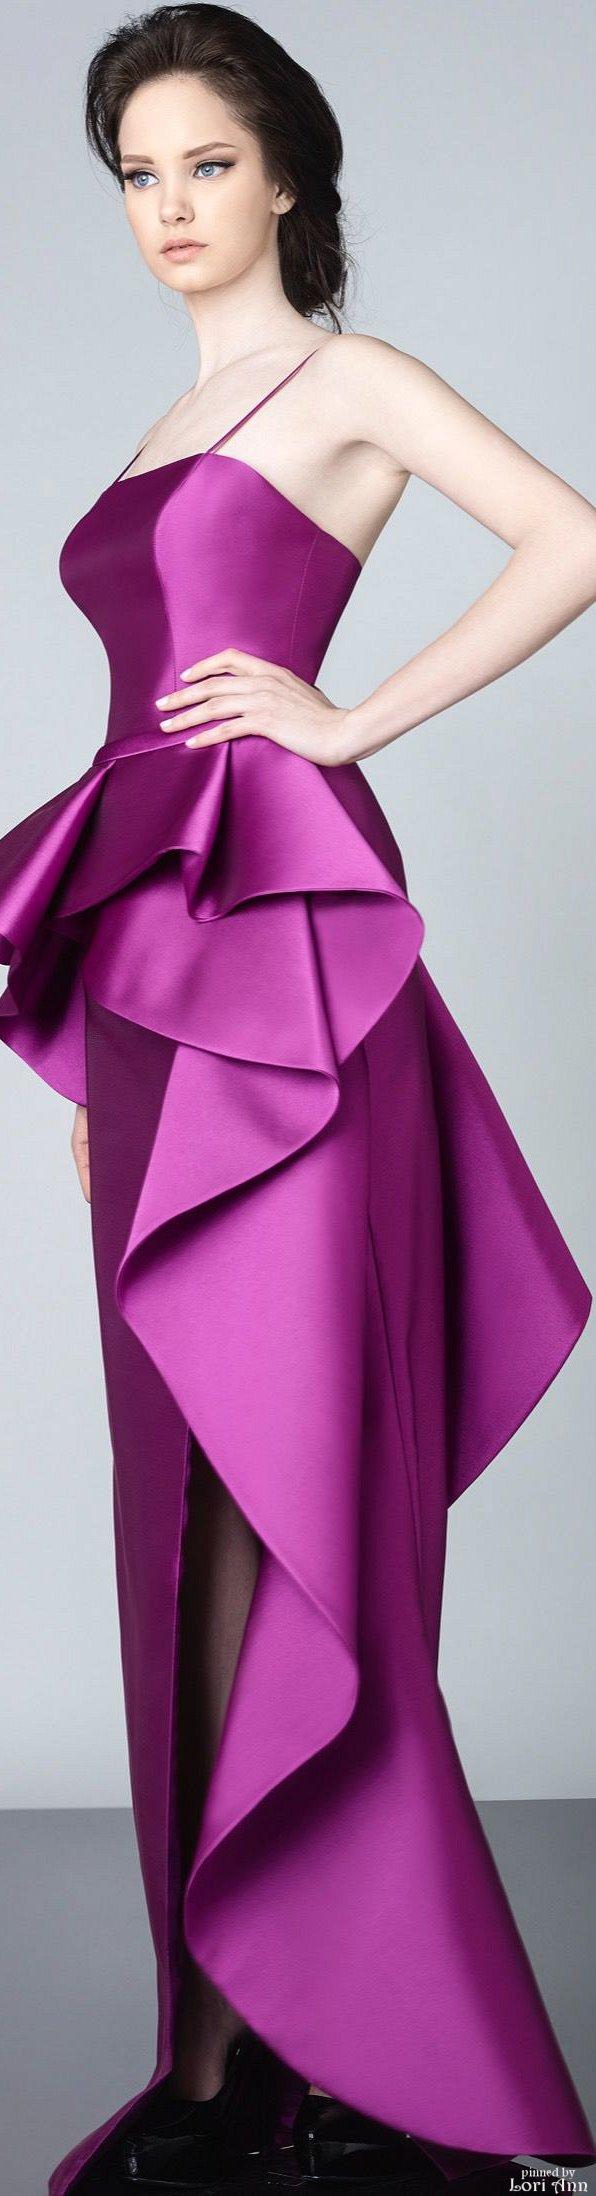 Lujoso Vestidos De Novia De Alta Costura única Ideas Ornamento ...